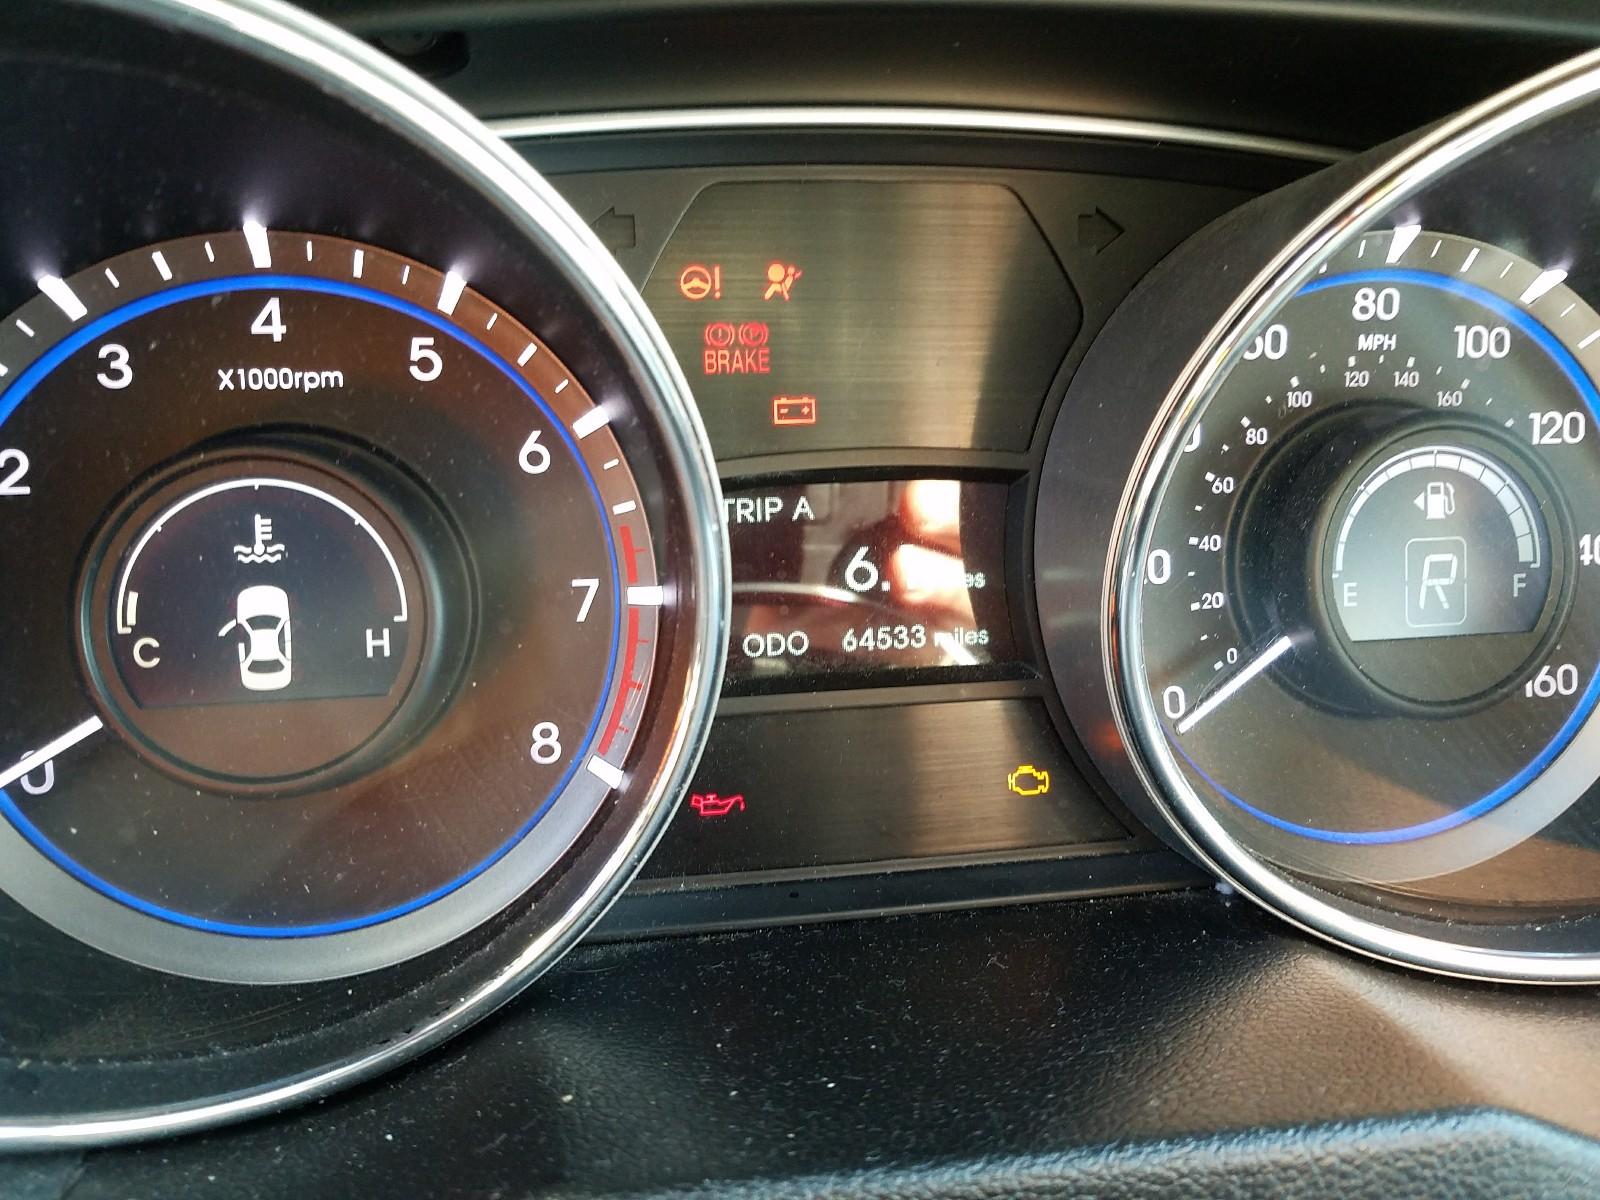 5NPEB4AC7EH889924 - 2014 Hyundai Sonata Gls 2.4L front view